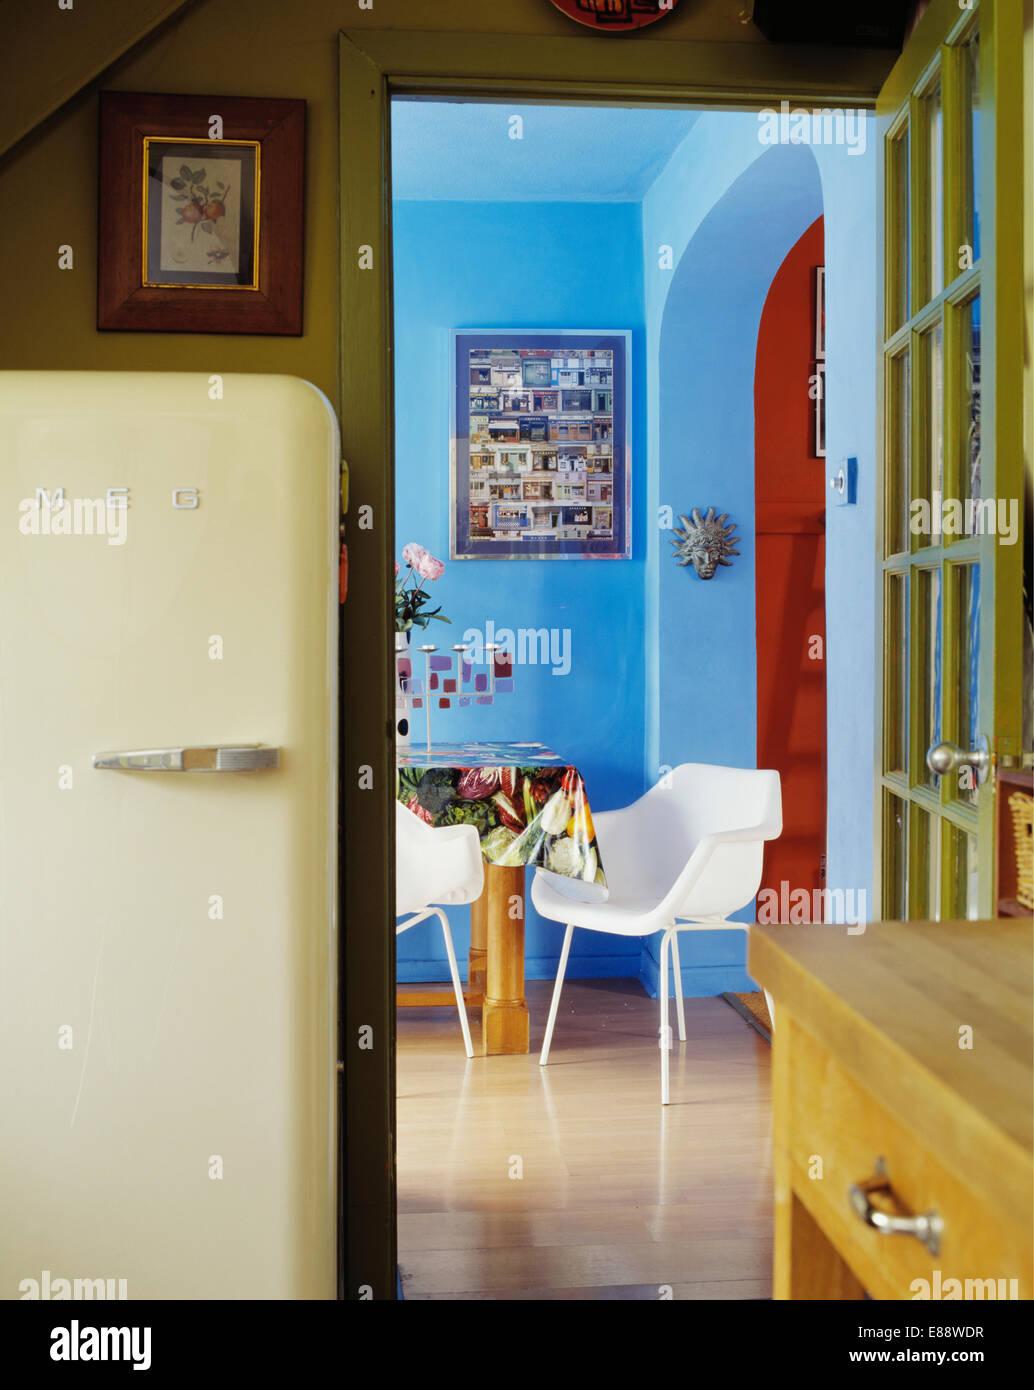 Kitchen with large cream Smeg refrigerator beside doorway to blue ...